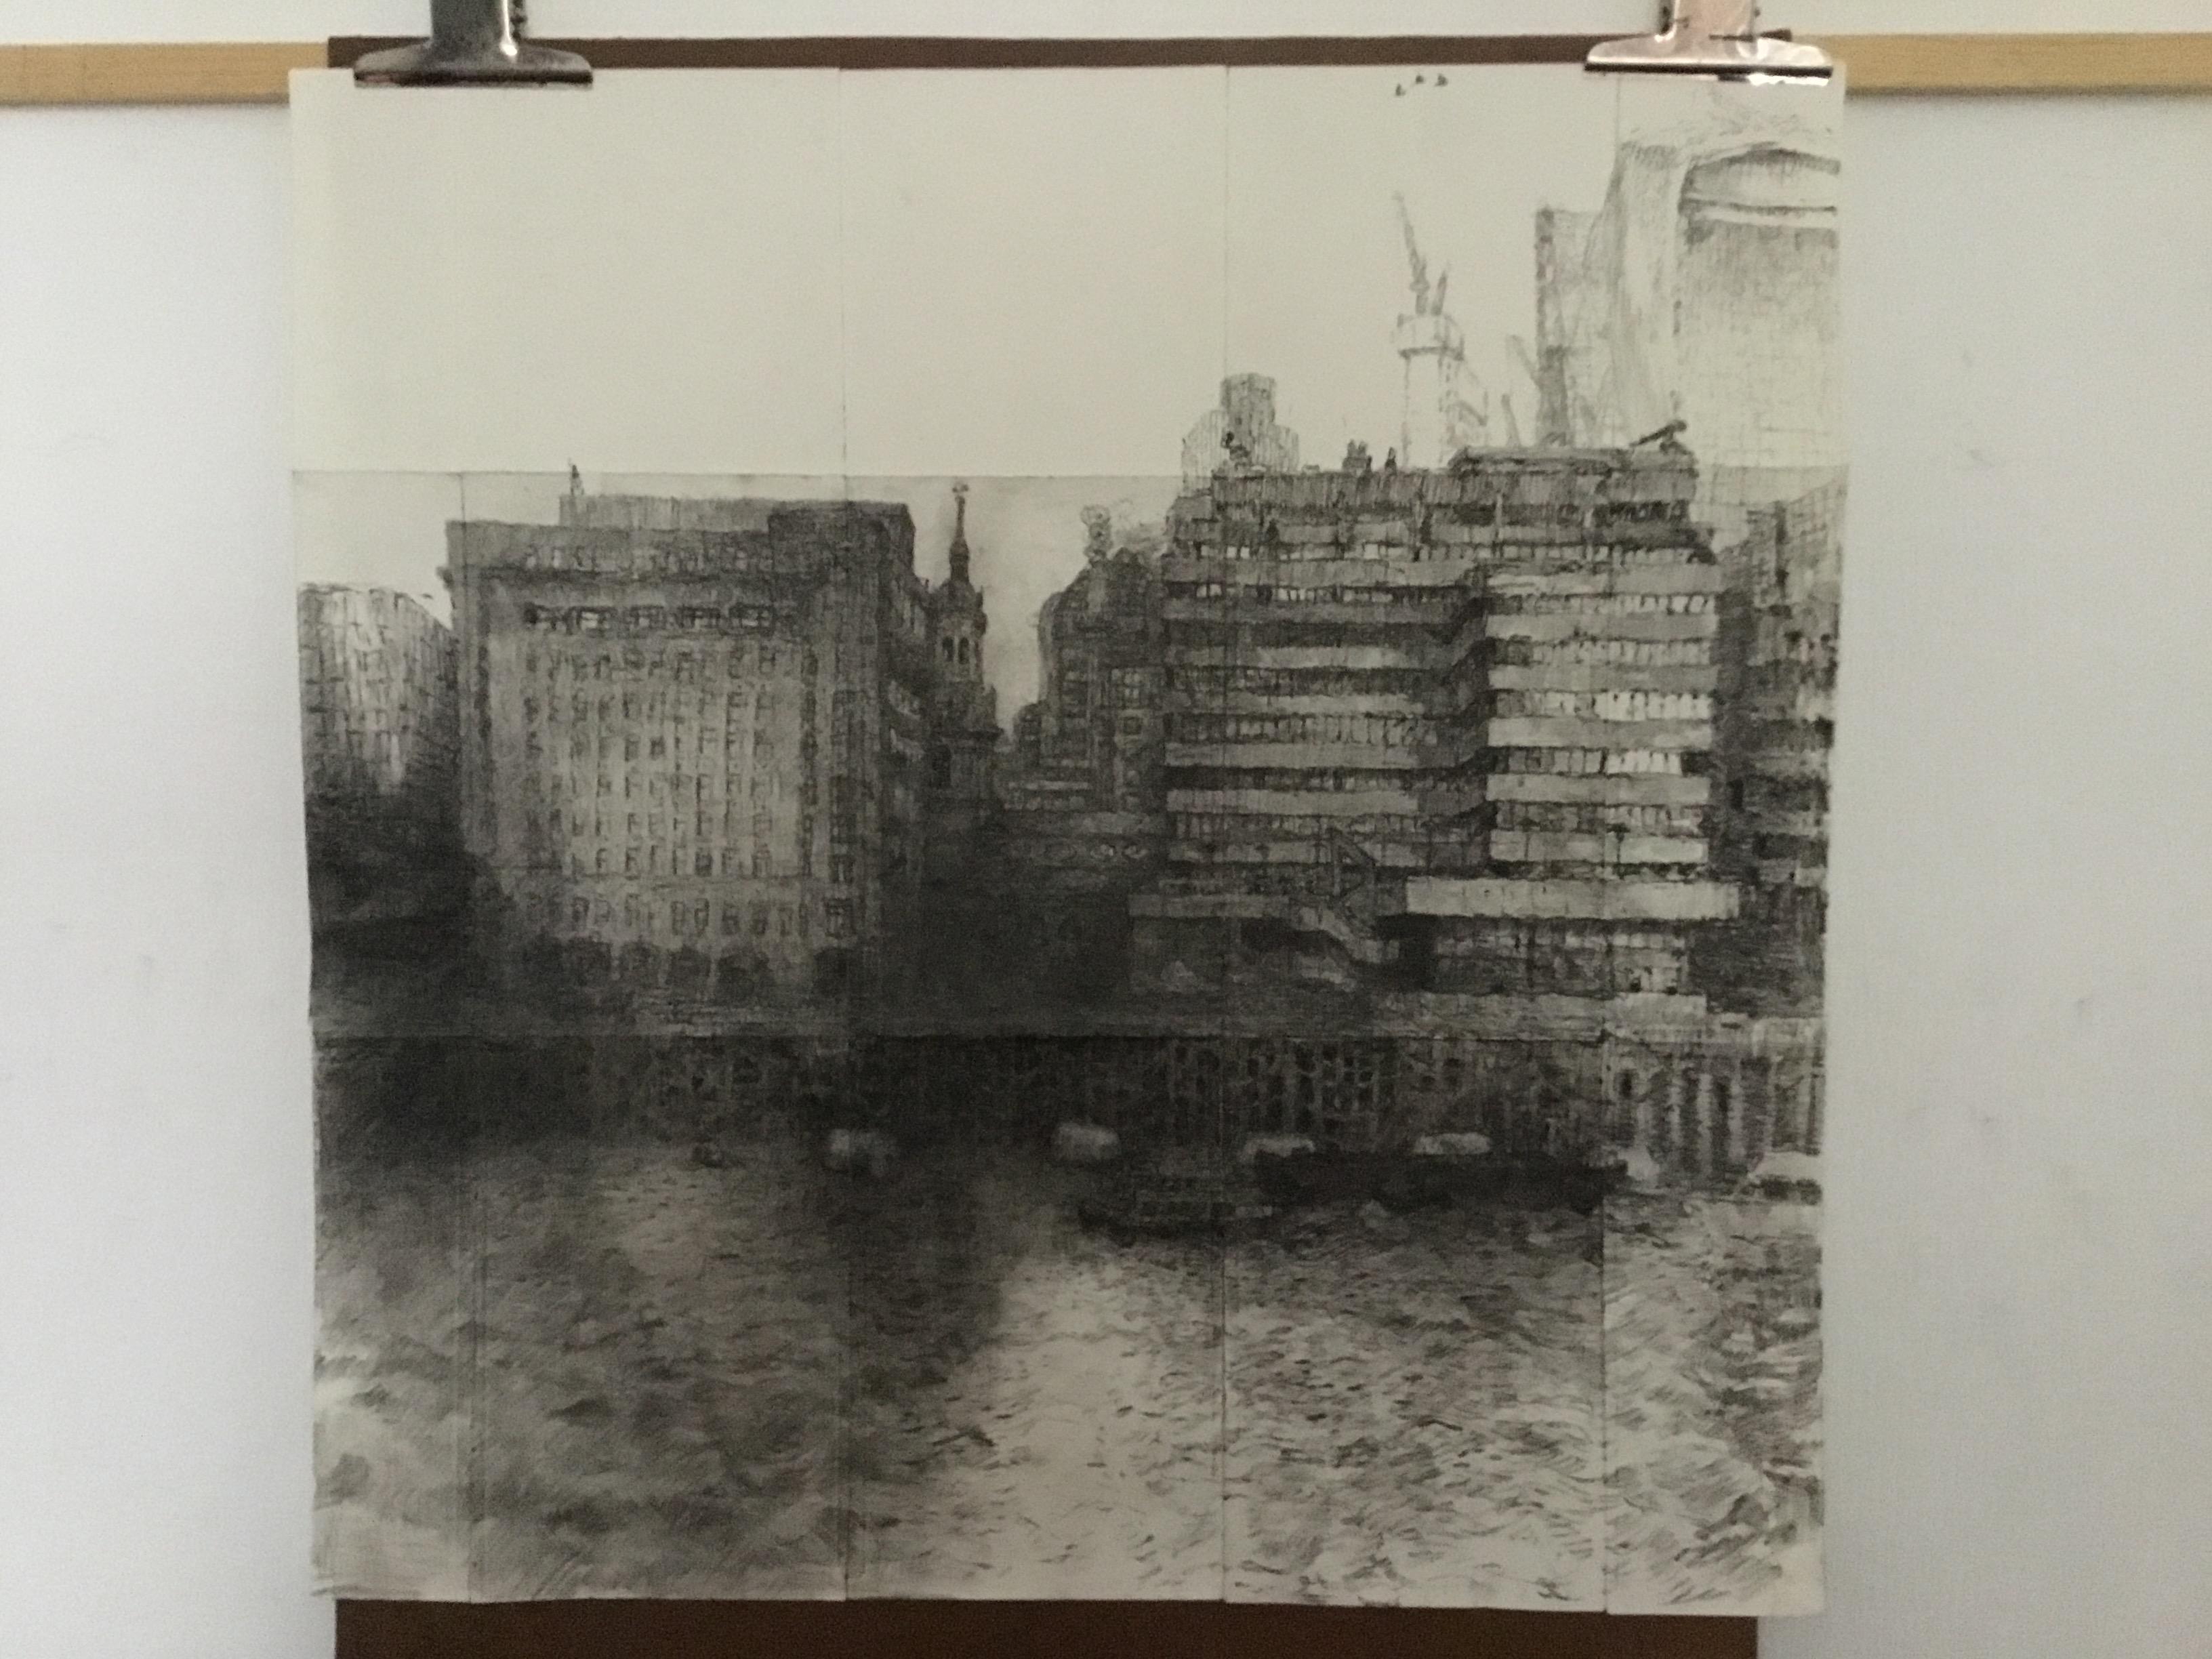 Work in Progress Christopher Green Pencil, 2017